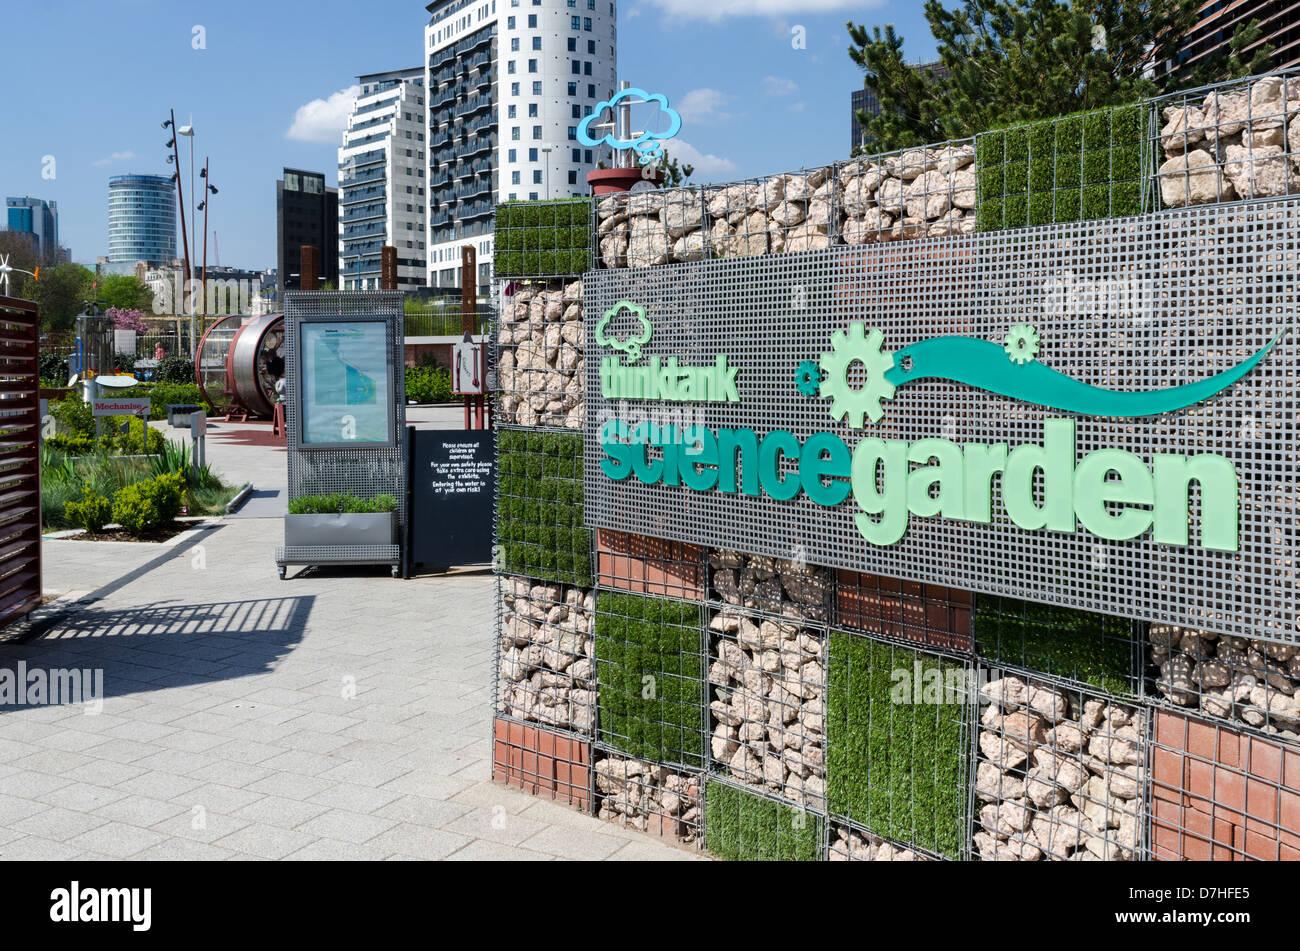 Entrance To The Science Garden At Thinktank, Millenium Point In Birmingham